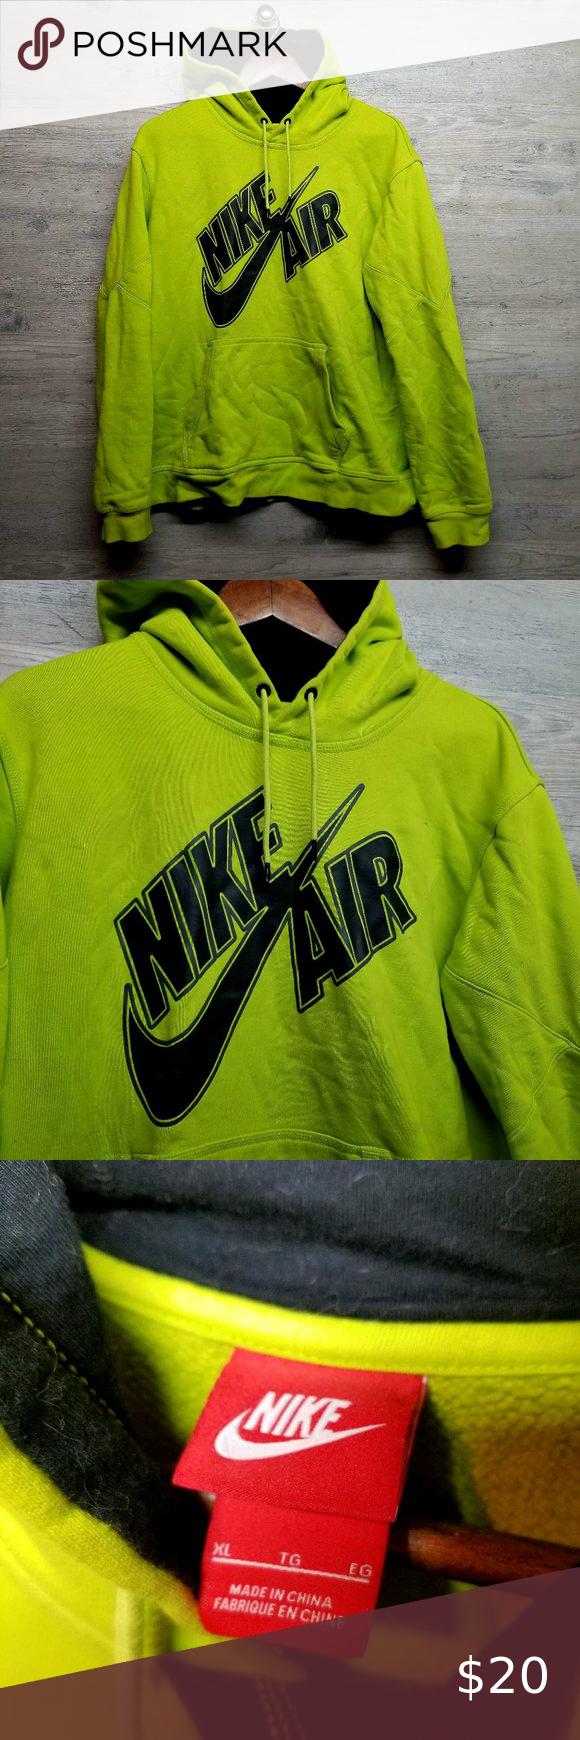 Nike Air Hoodie Sweatshirt Perfect Condition Nike Air Hoodie Sweatshirts Sweatshirts Hoodie [ 1740 x 580 Pixel ]